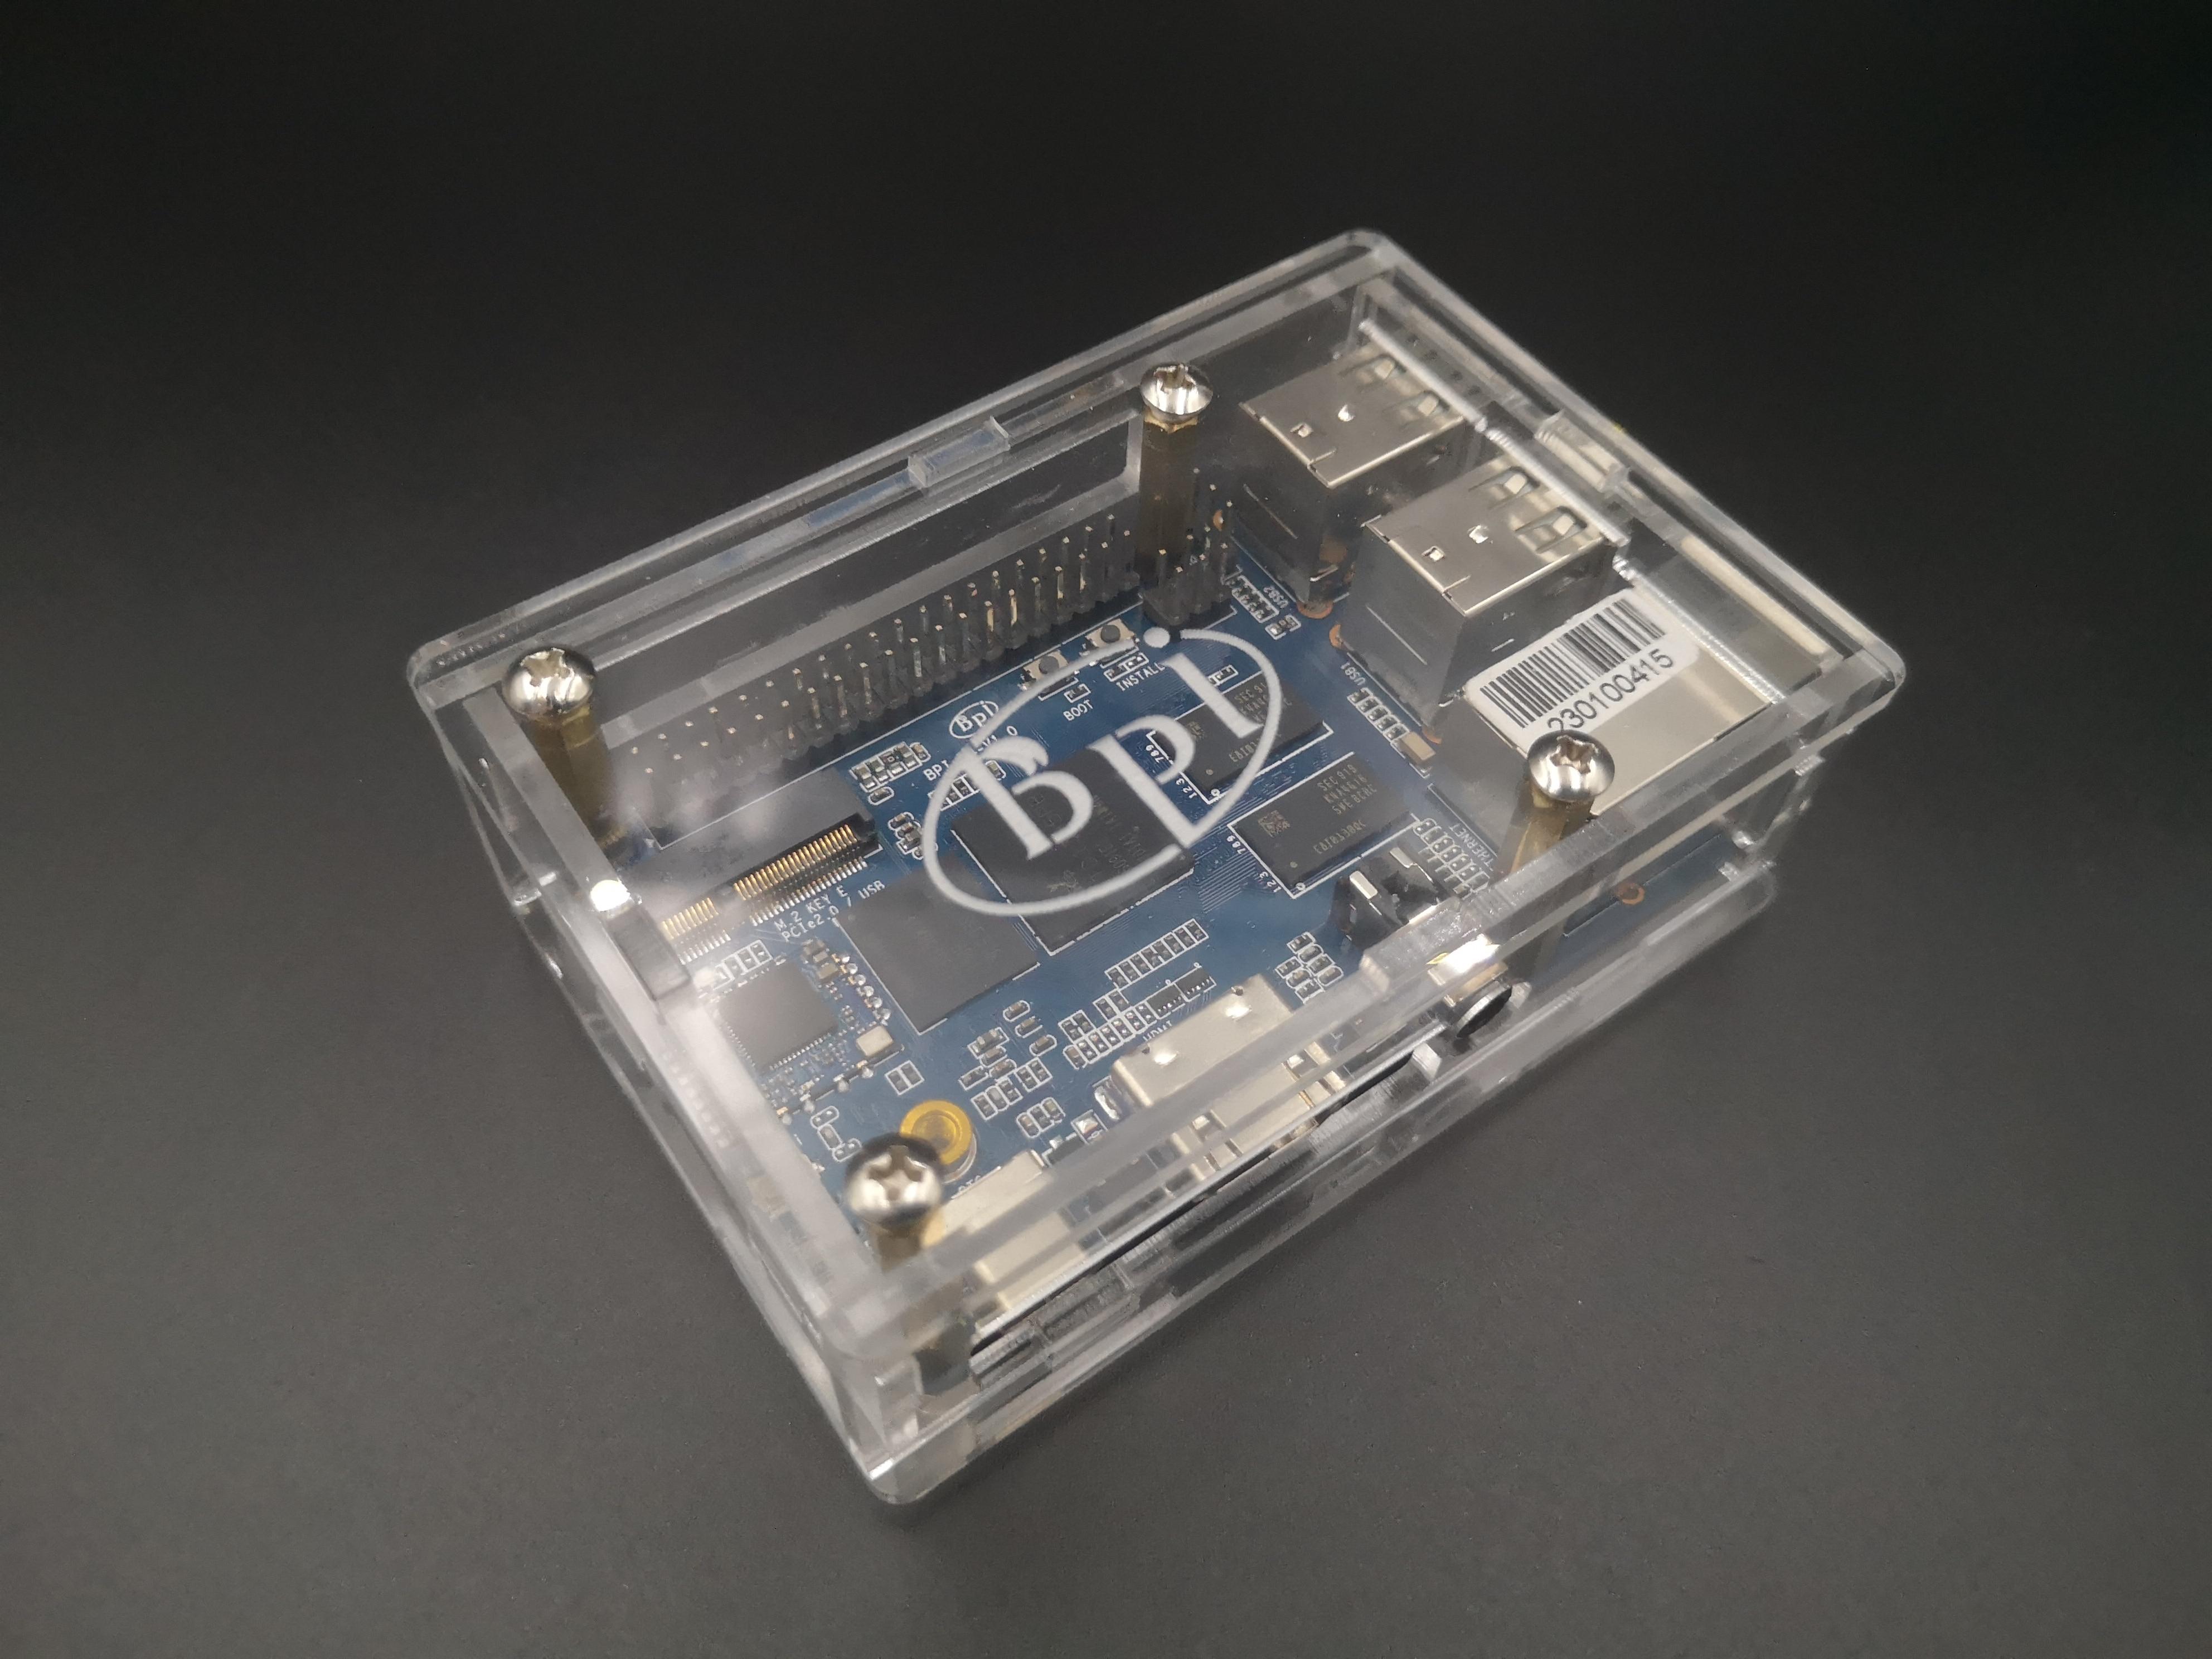 BPI M4 Acrylic Case Banana Pi Board Good Quality Acrylic Clear Case